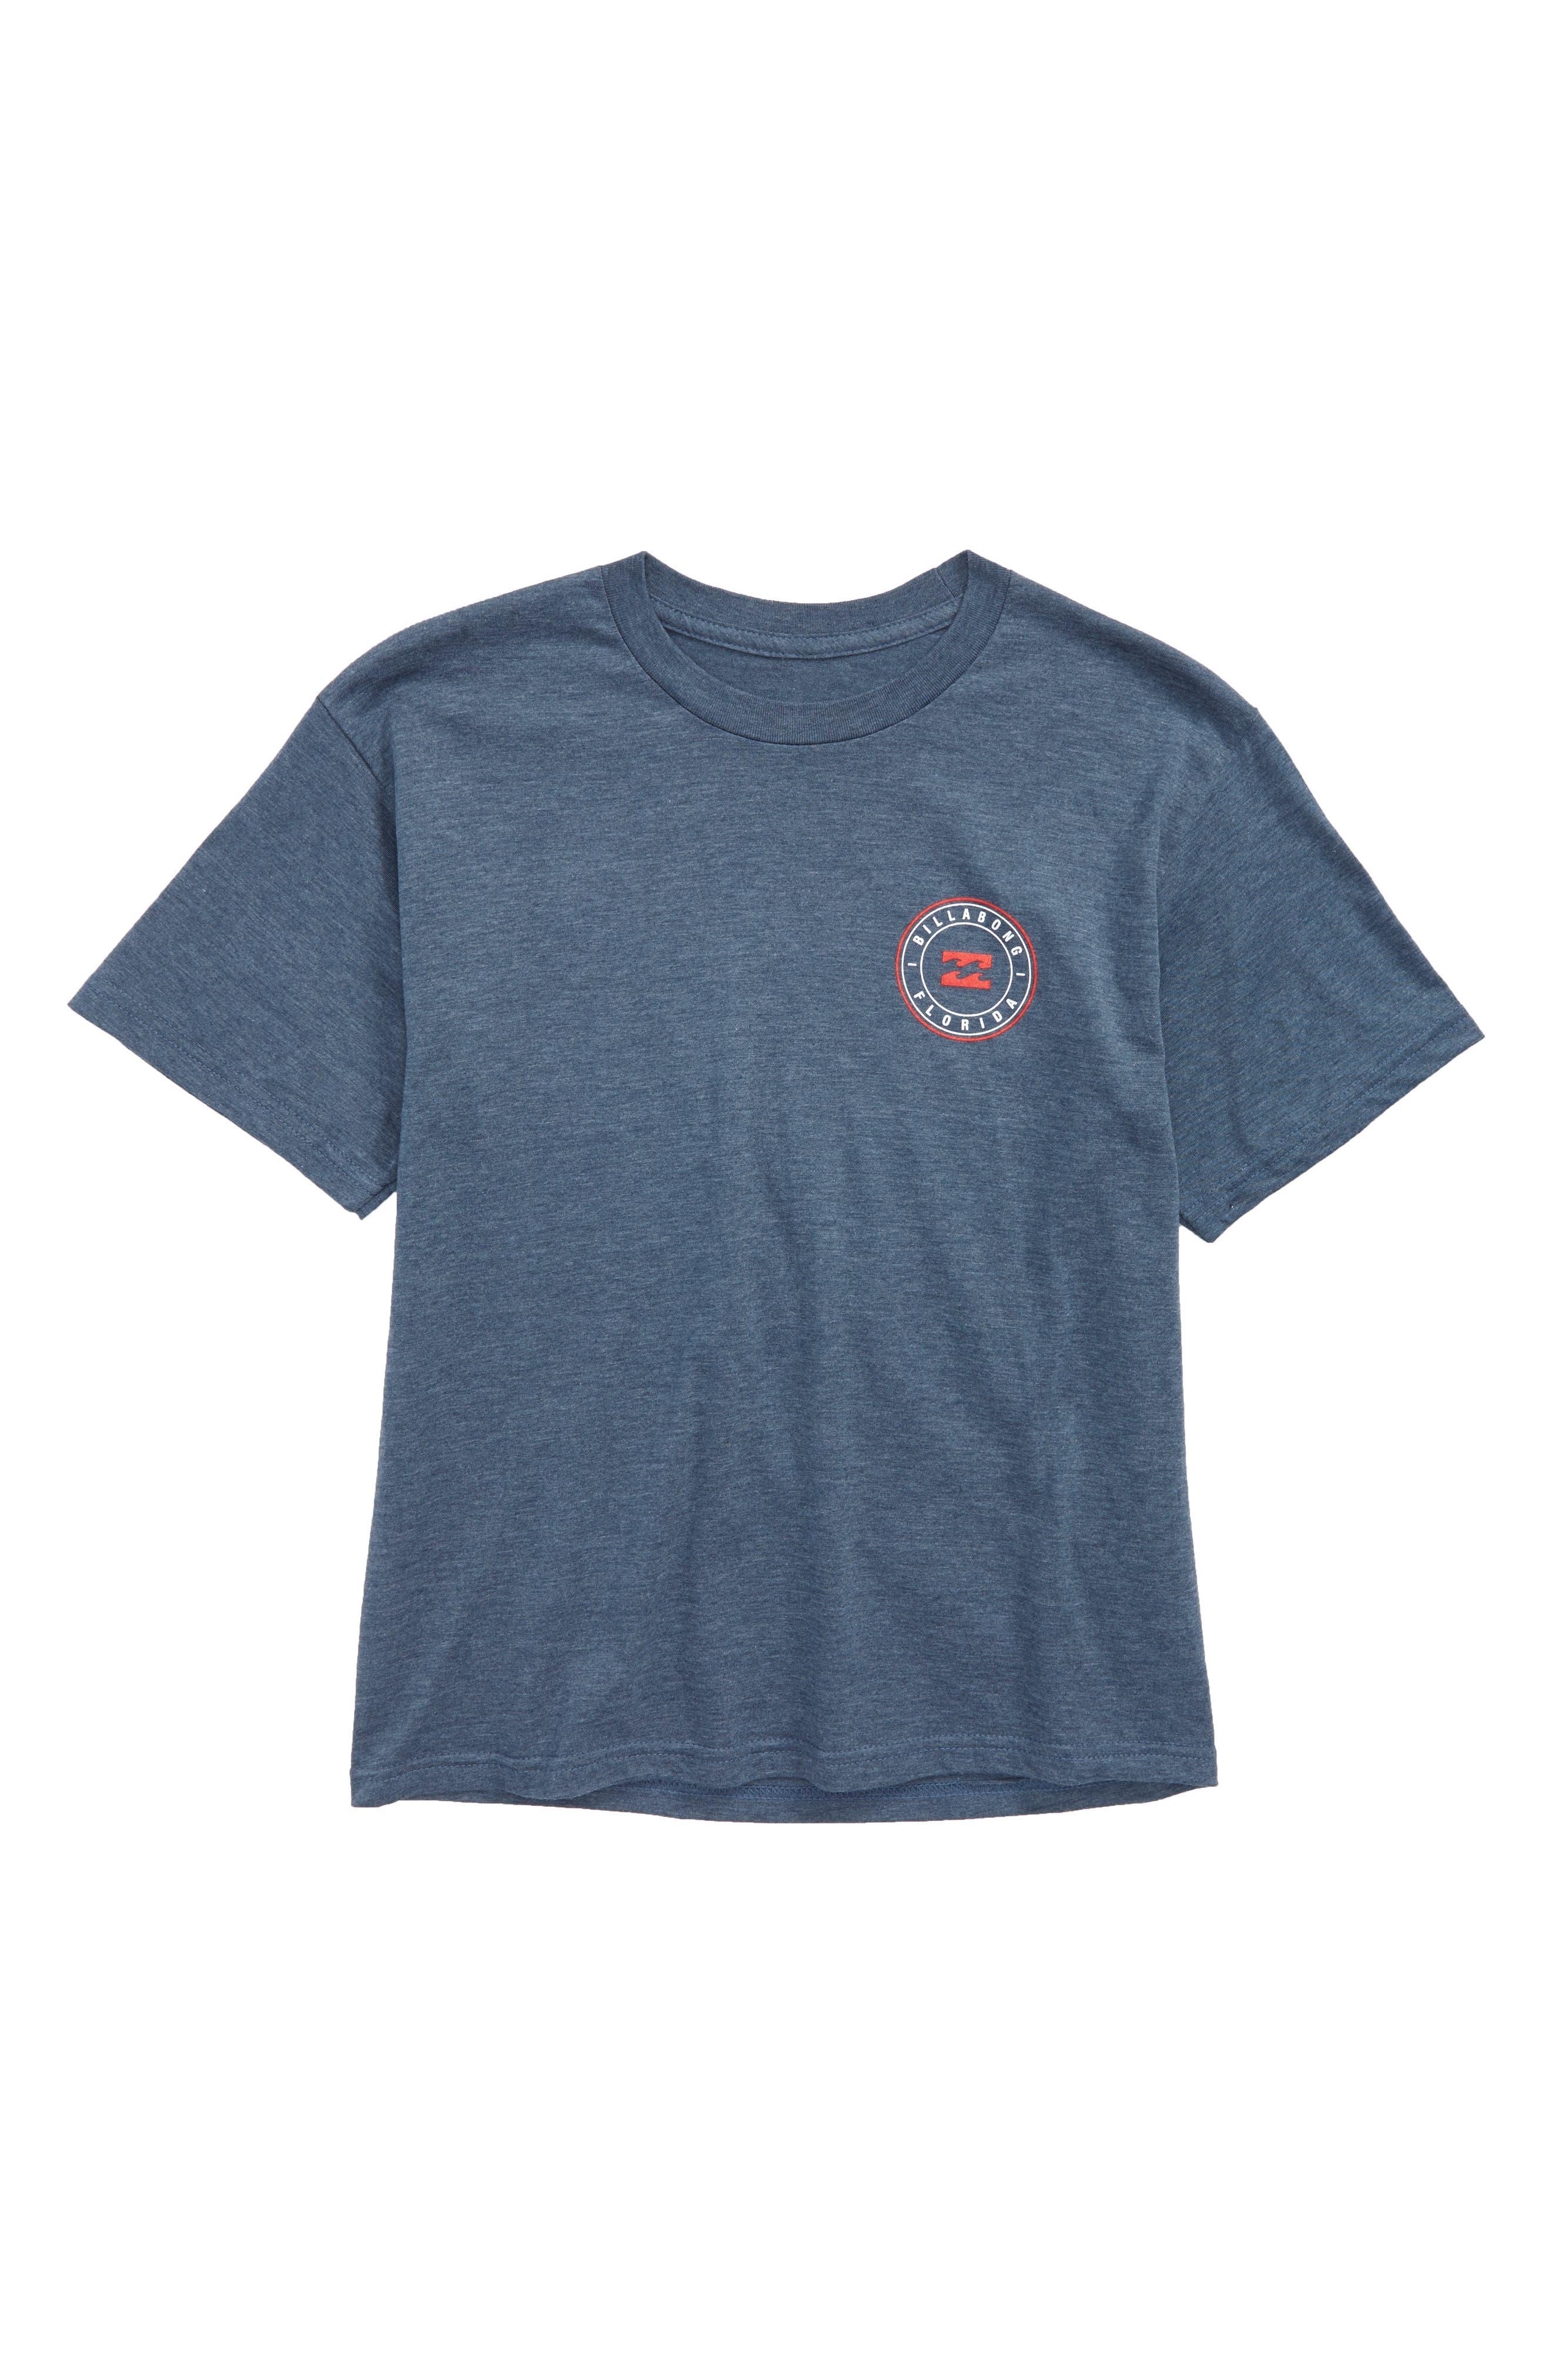 Native Rotor FL T-Shirt,                             Main thumbnail 1, color,                             Denim Heather